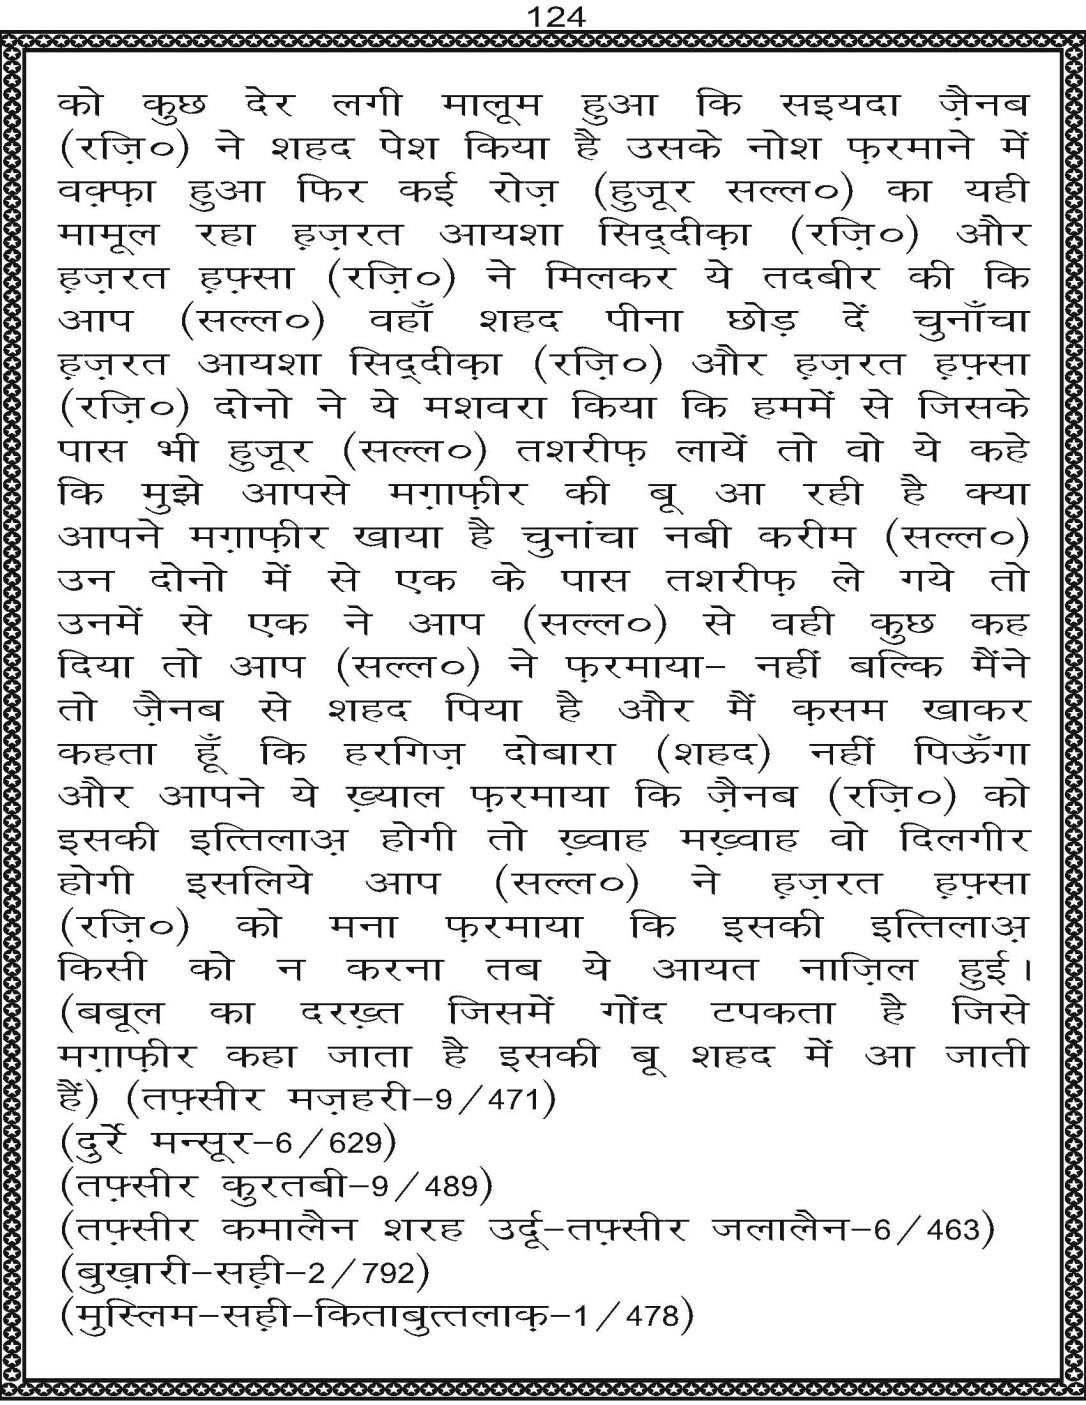 AzmateTaziyadari_Page_124